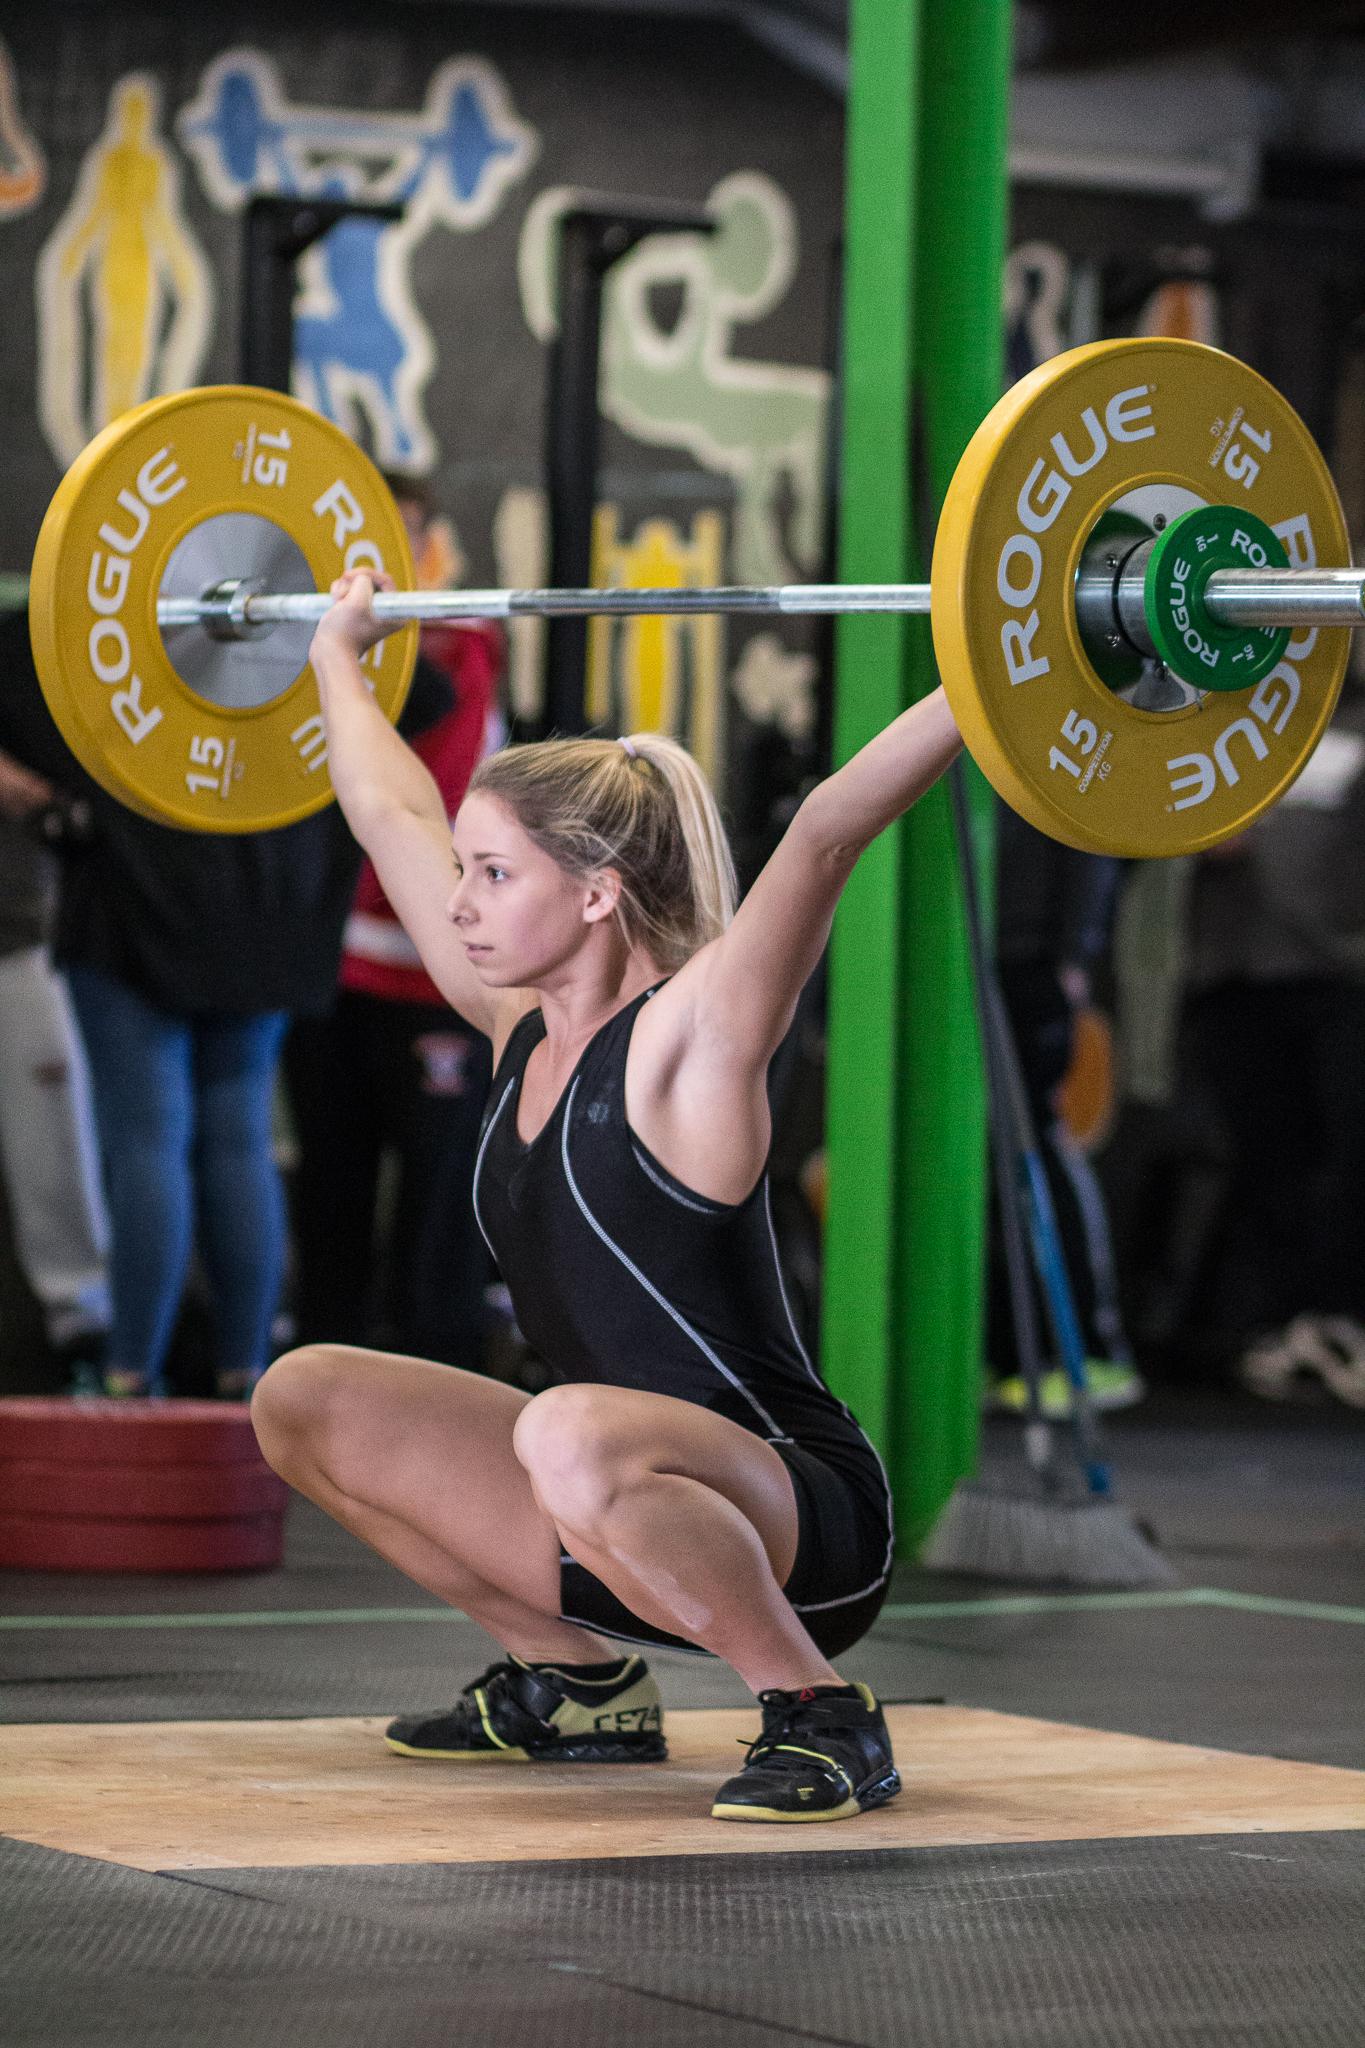 4-men-warwick-new-york-intrepid-strength-conditioning-winter-open-weightlifting-meet-weightlifting-photography (5 of 7).jpg